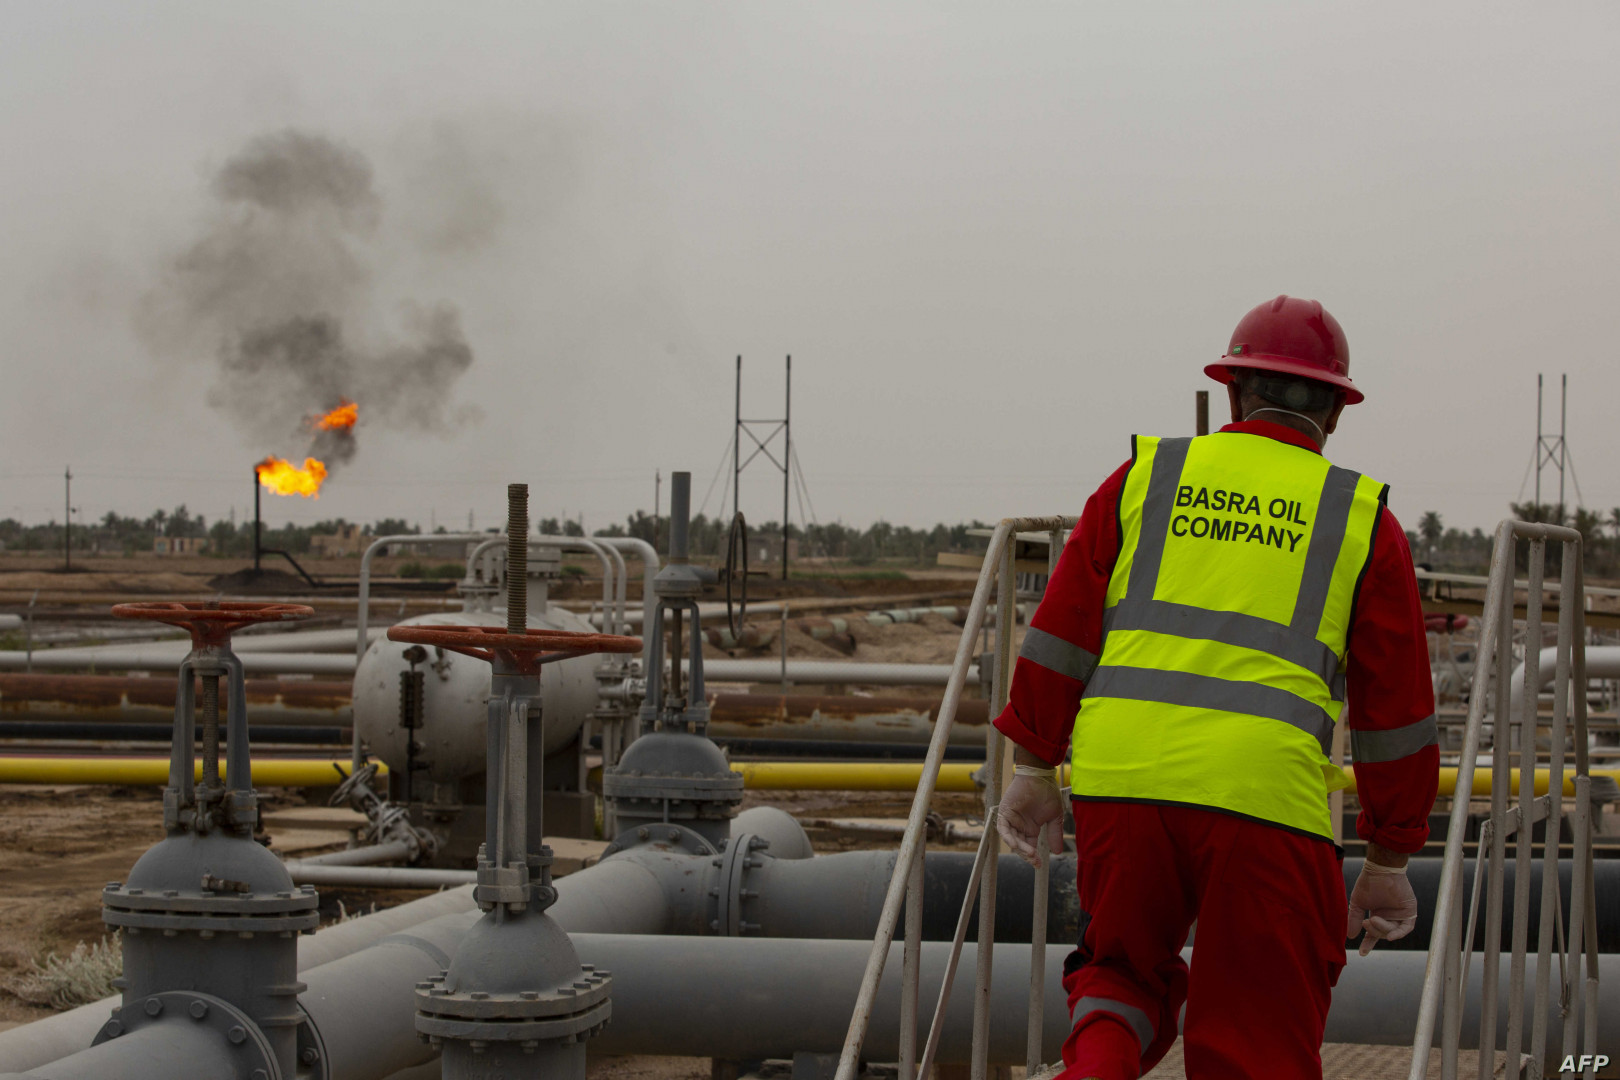 Basra light drops but remains on top of a OPEC crudes